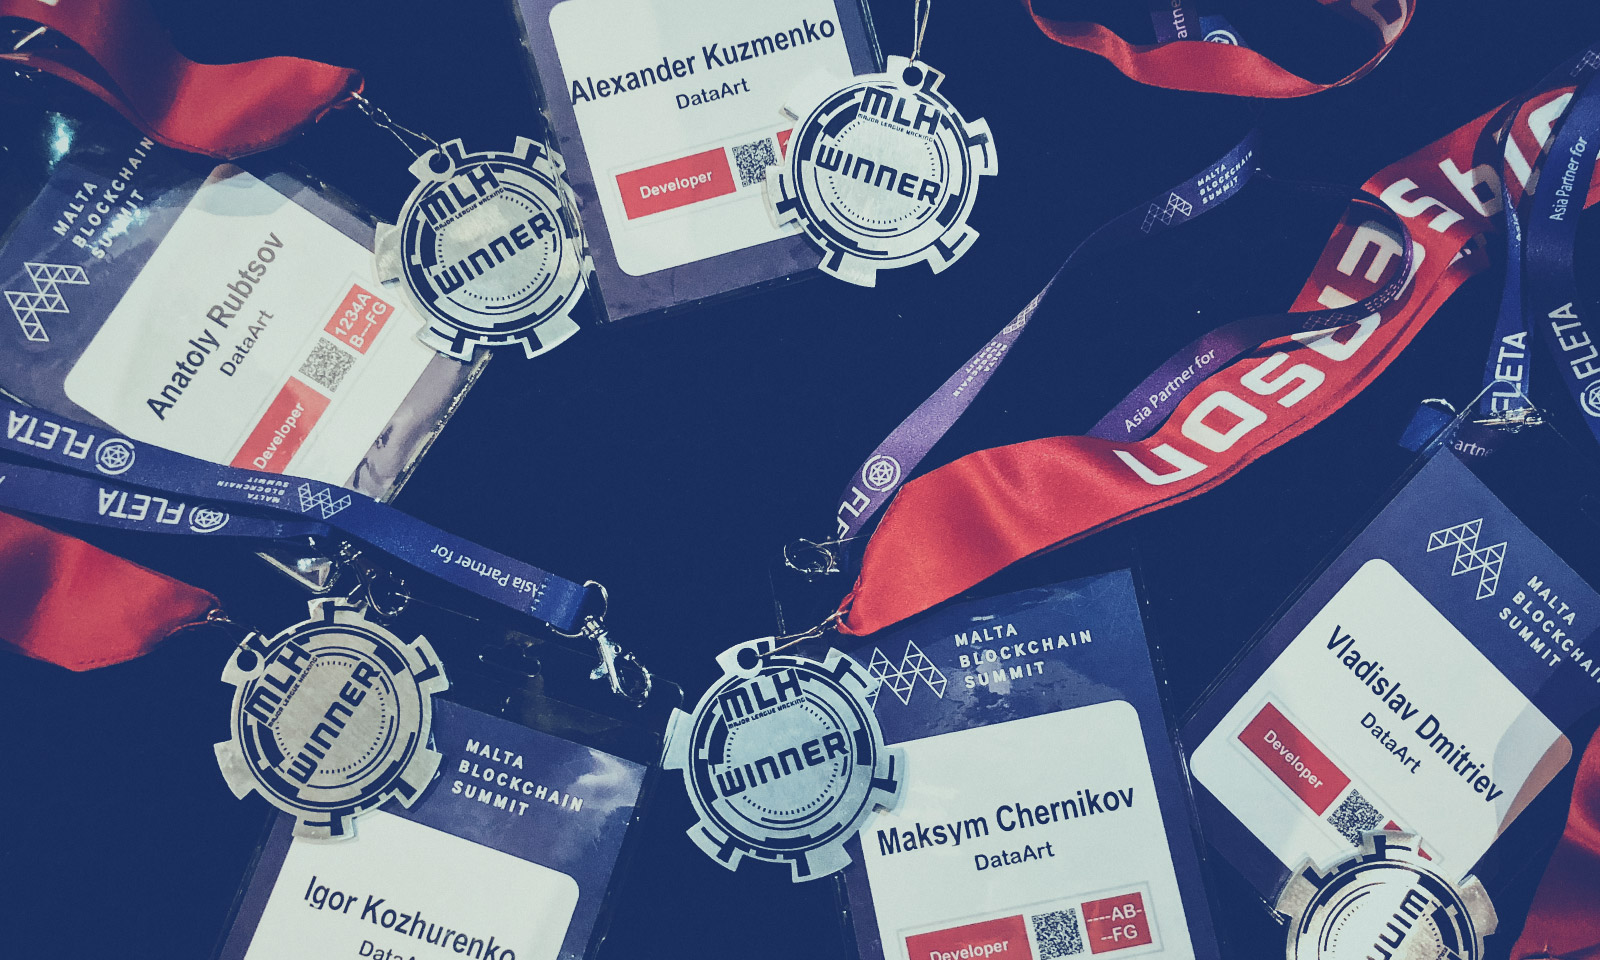 Блокчейн-благотворительность — DataArt победил на хакатоне Malta Blockchain Summit